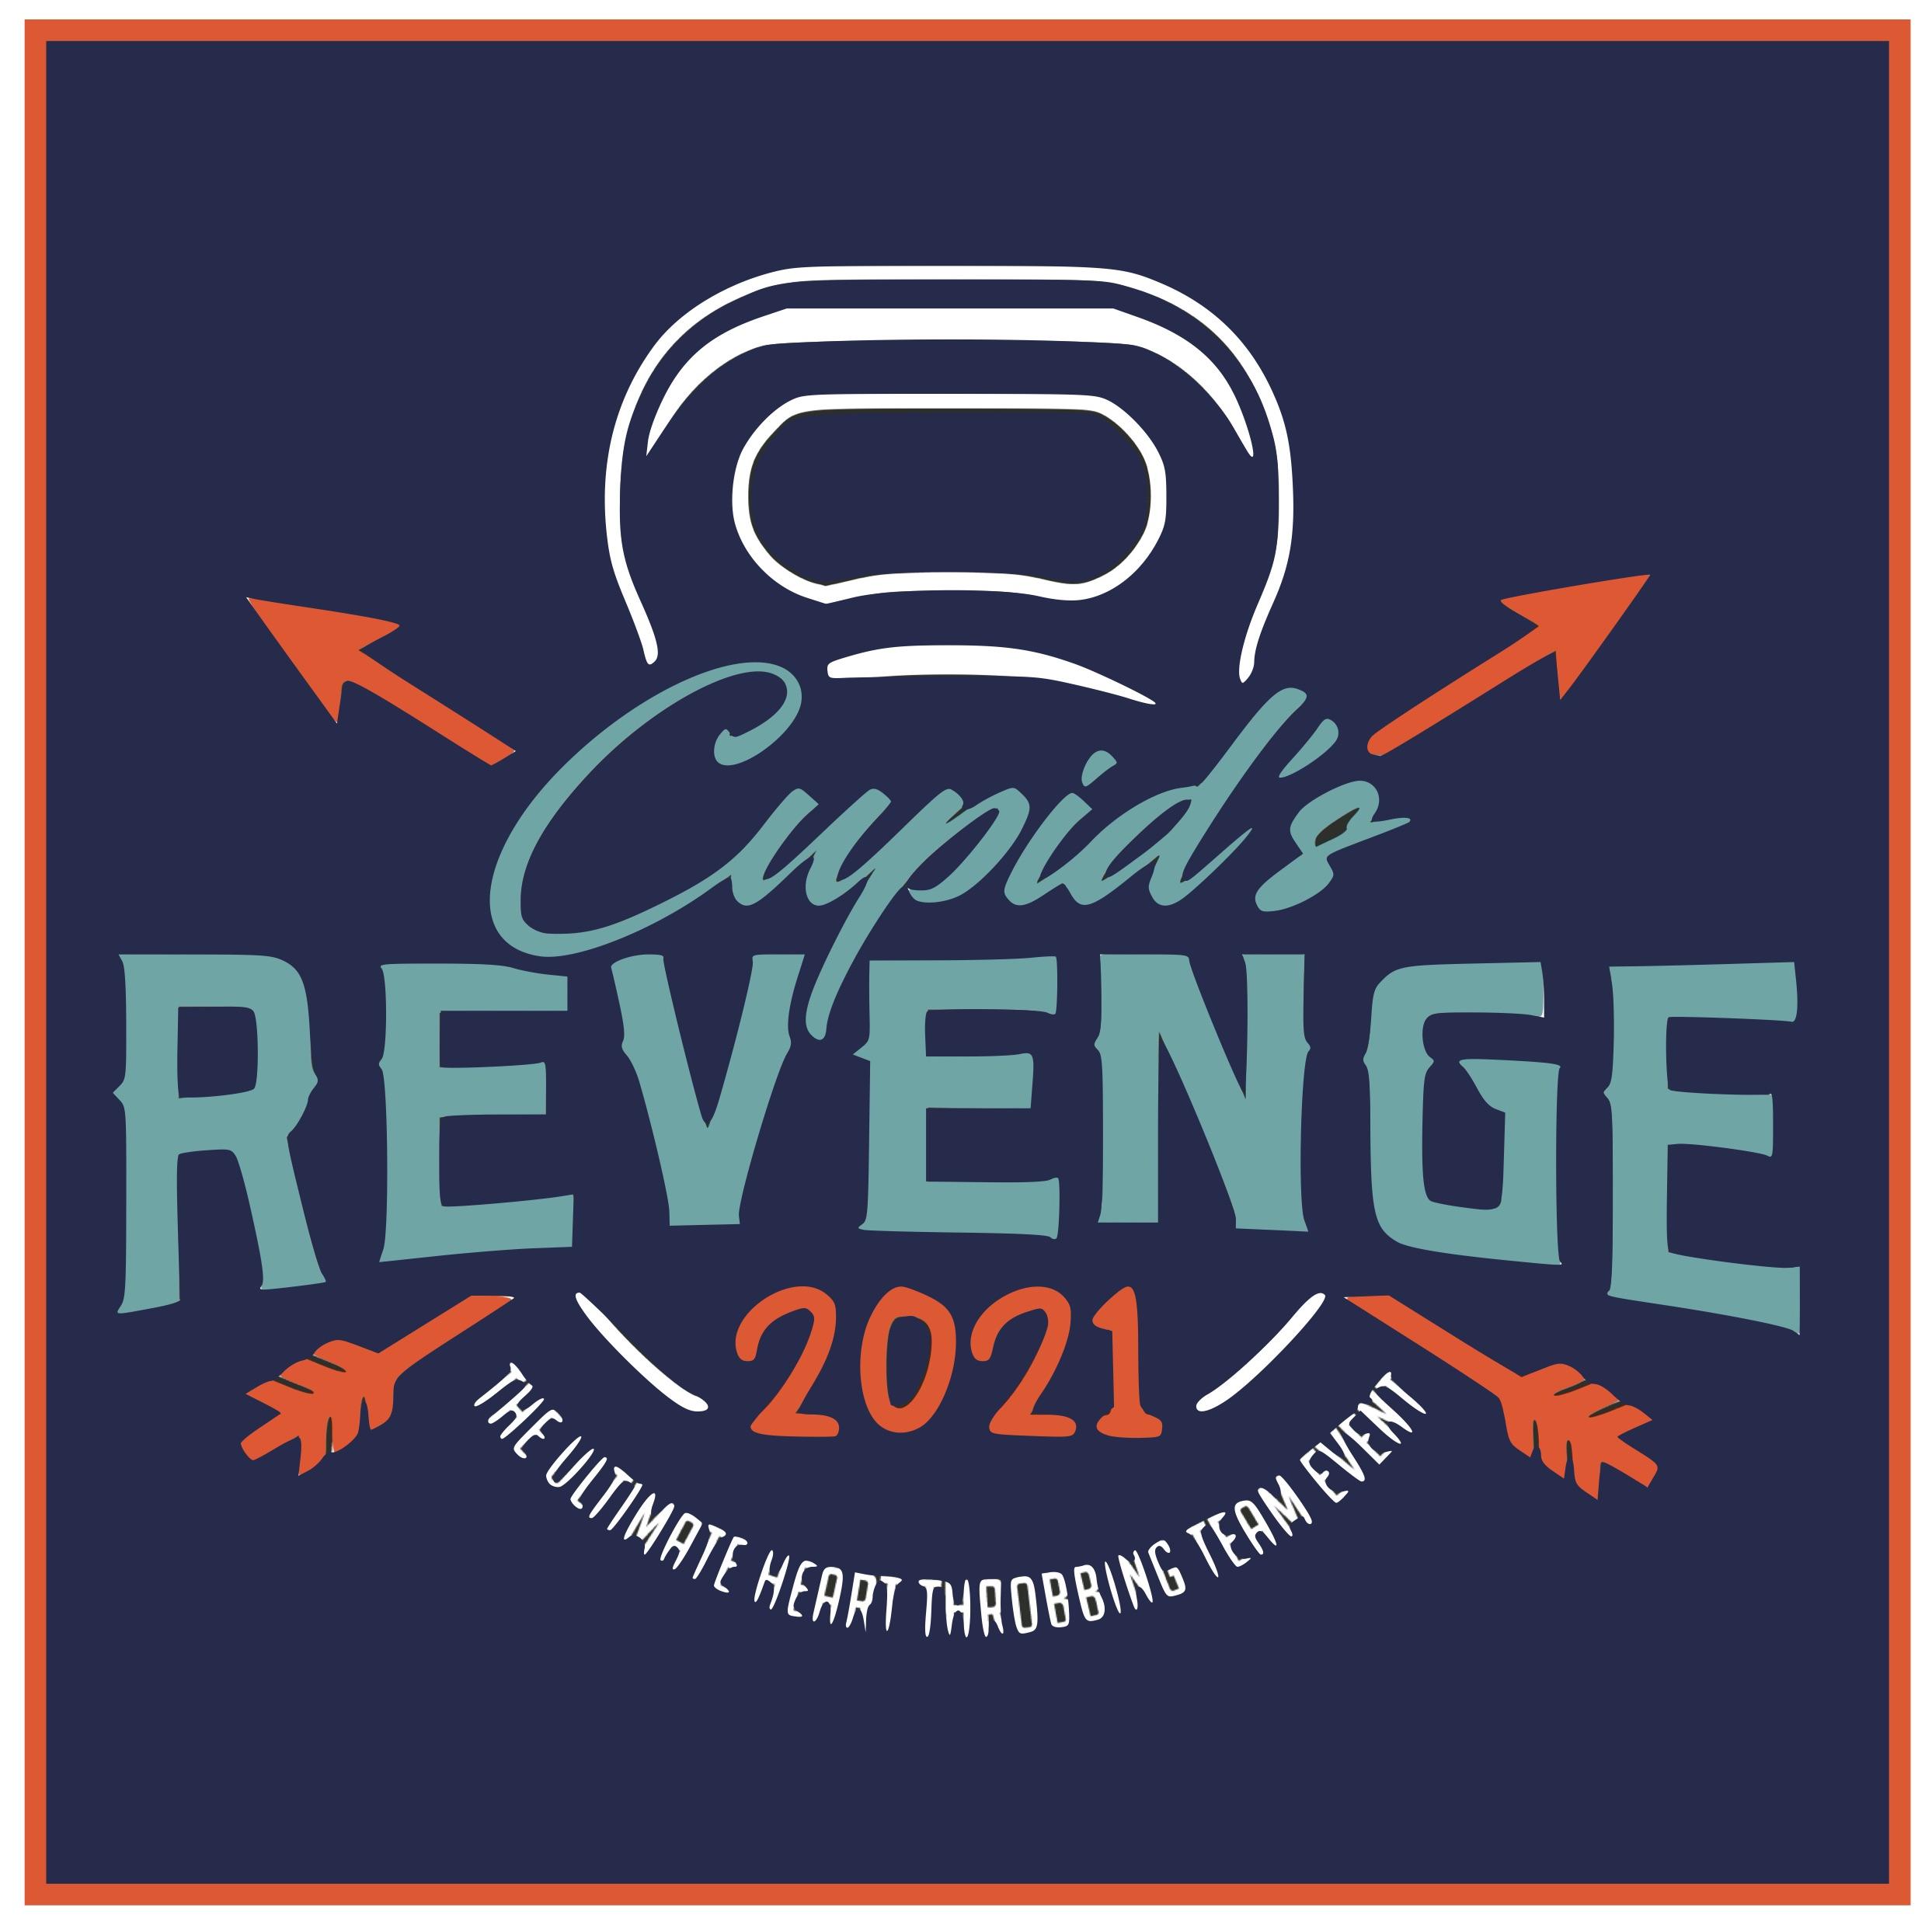 2021 Cupid's Revenge